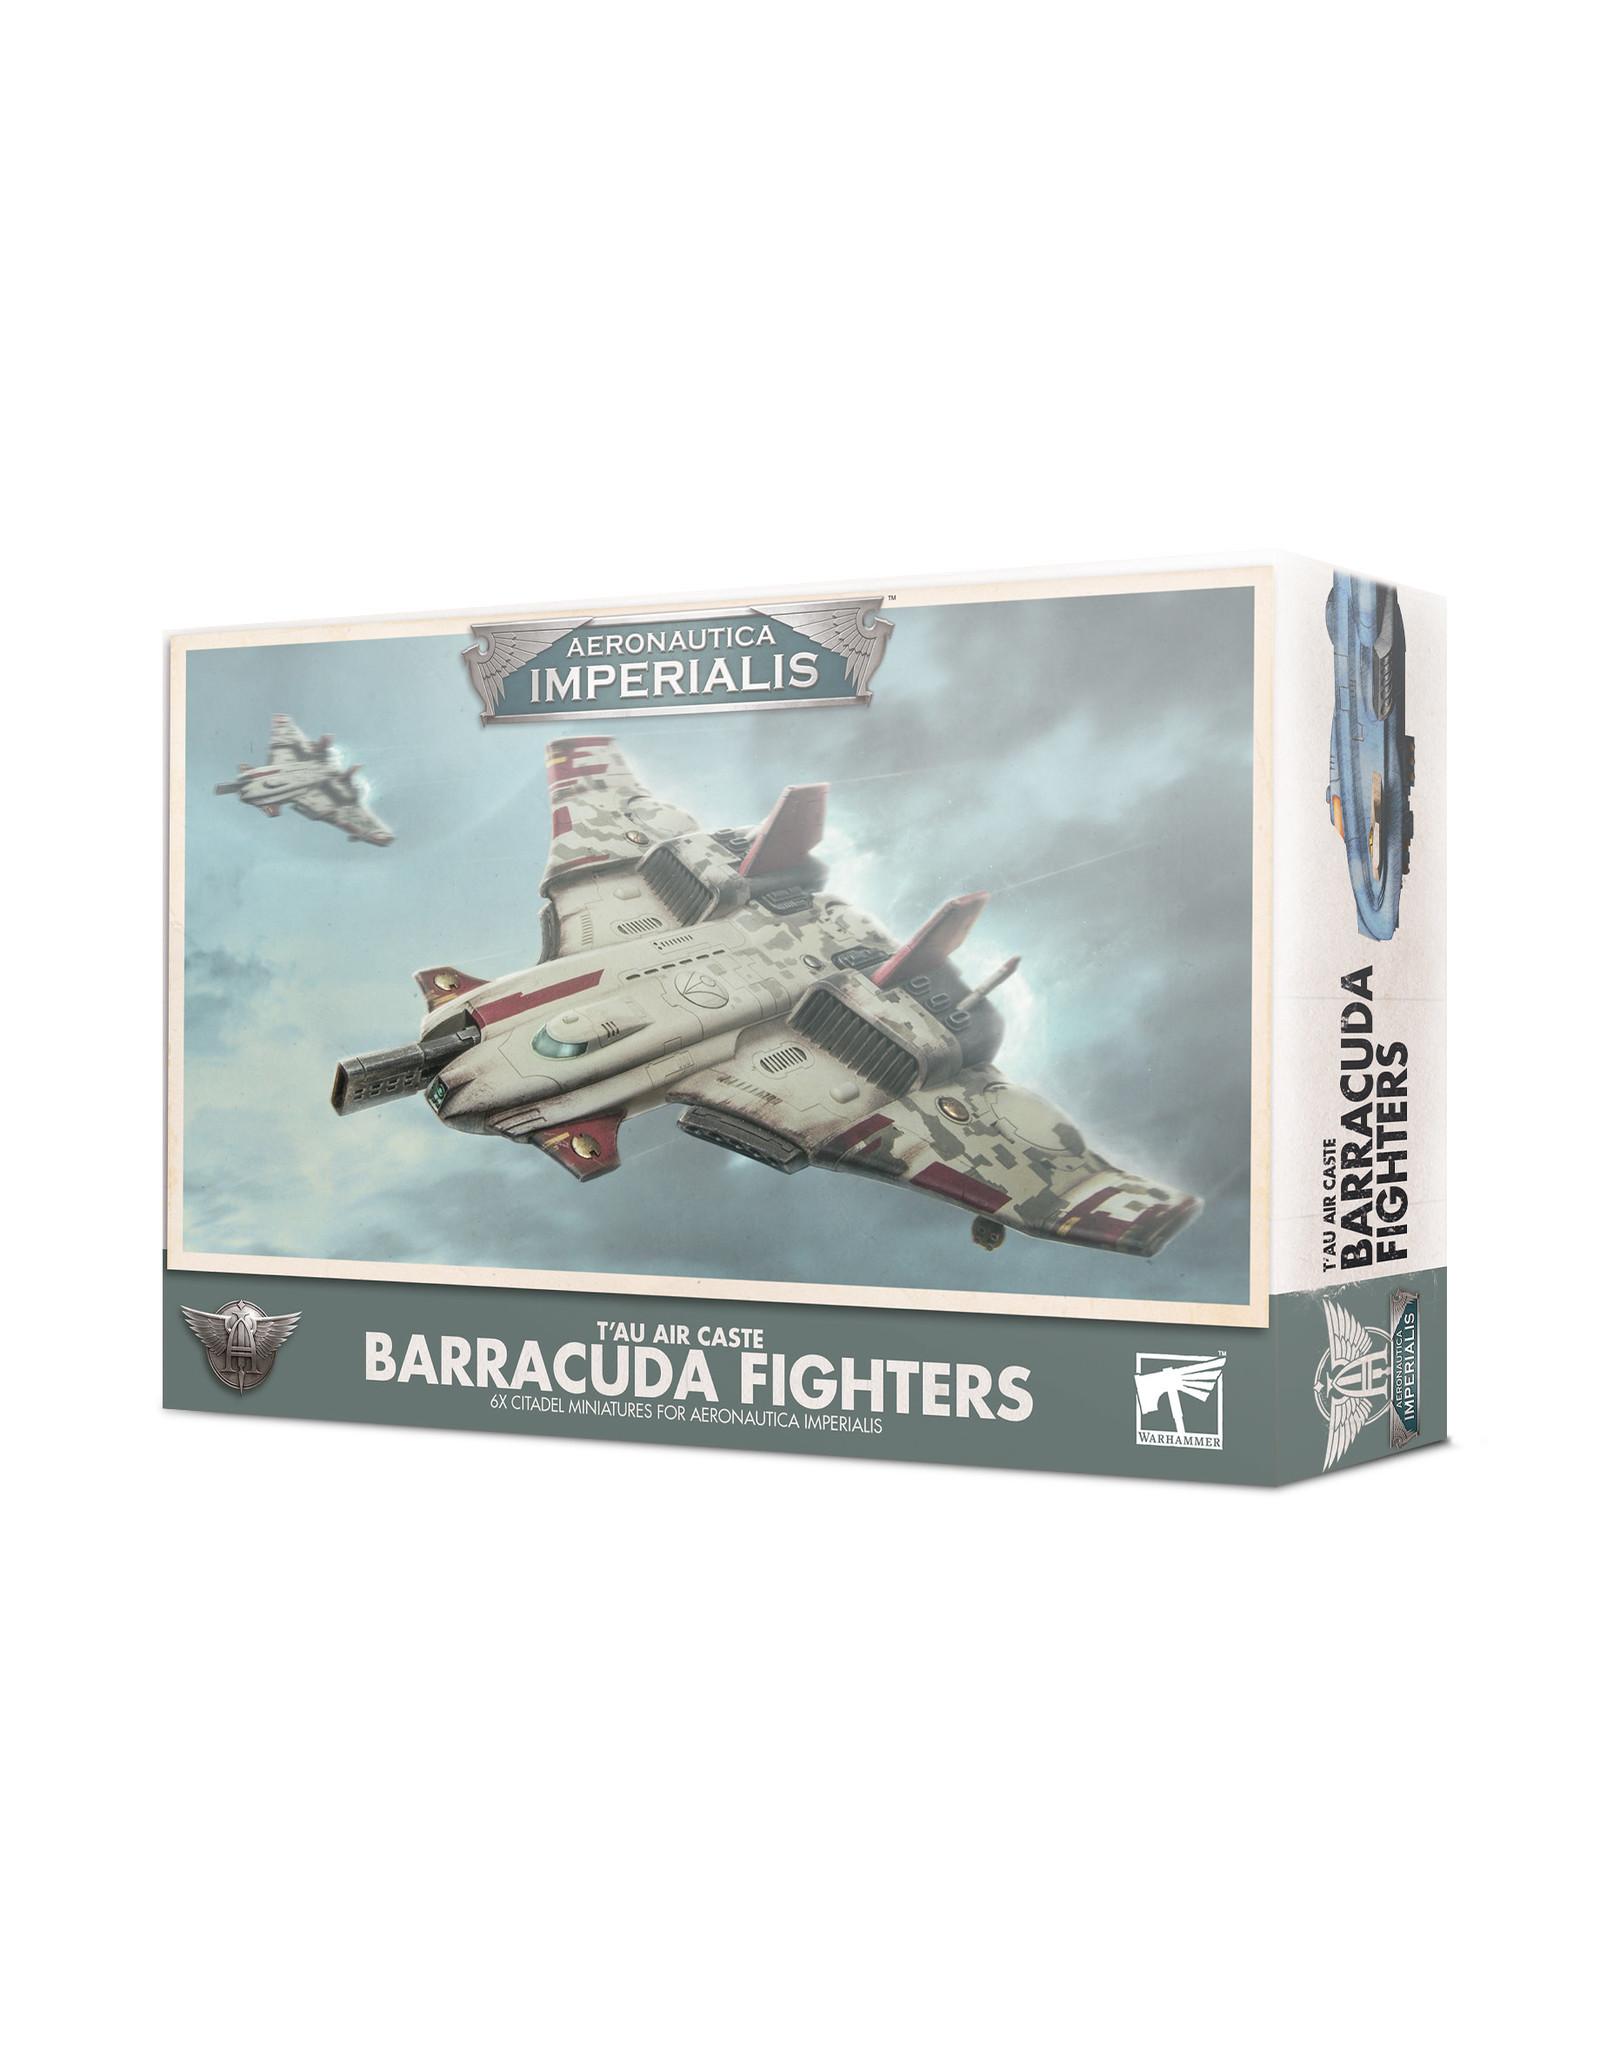 Games Workshop Aeronautica Imperialis: T'au Air Caste Barracuda Fighters